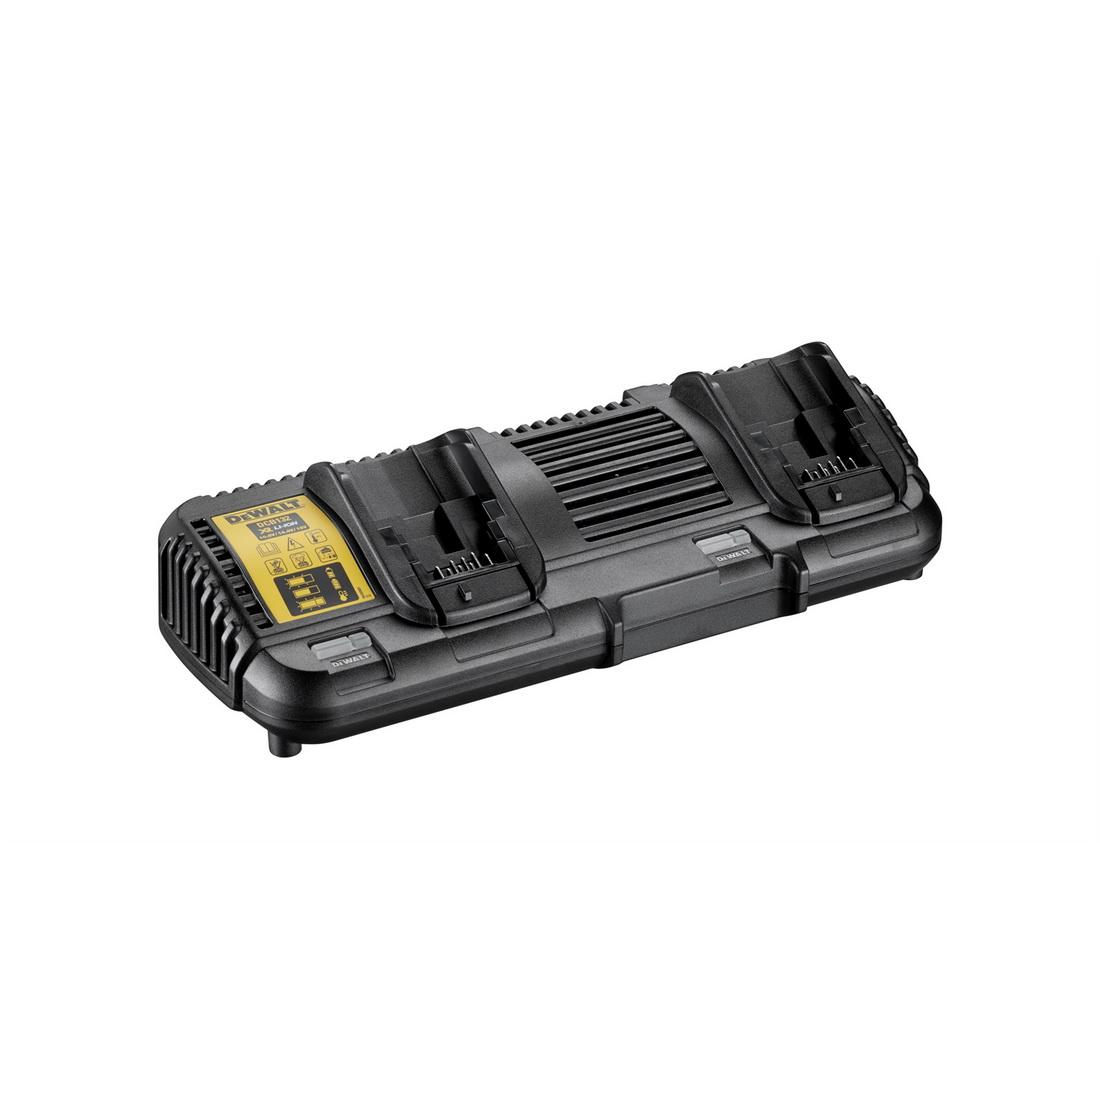 FLEXVOLT 18-54V XR Lithium-Ion Dual Port Battery Charger